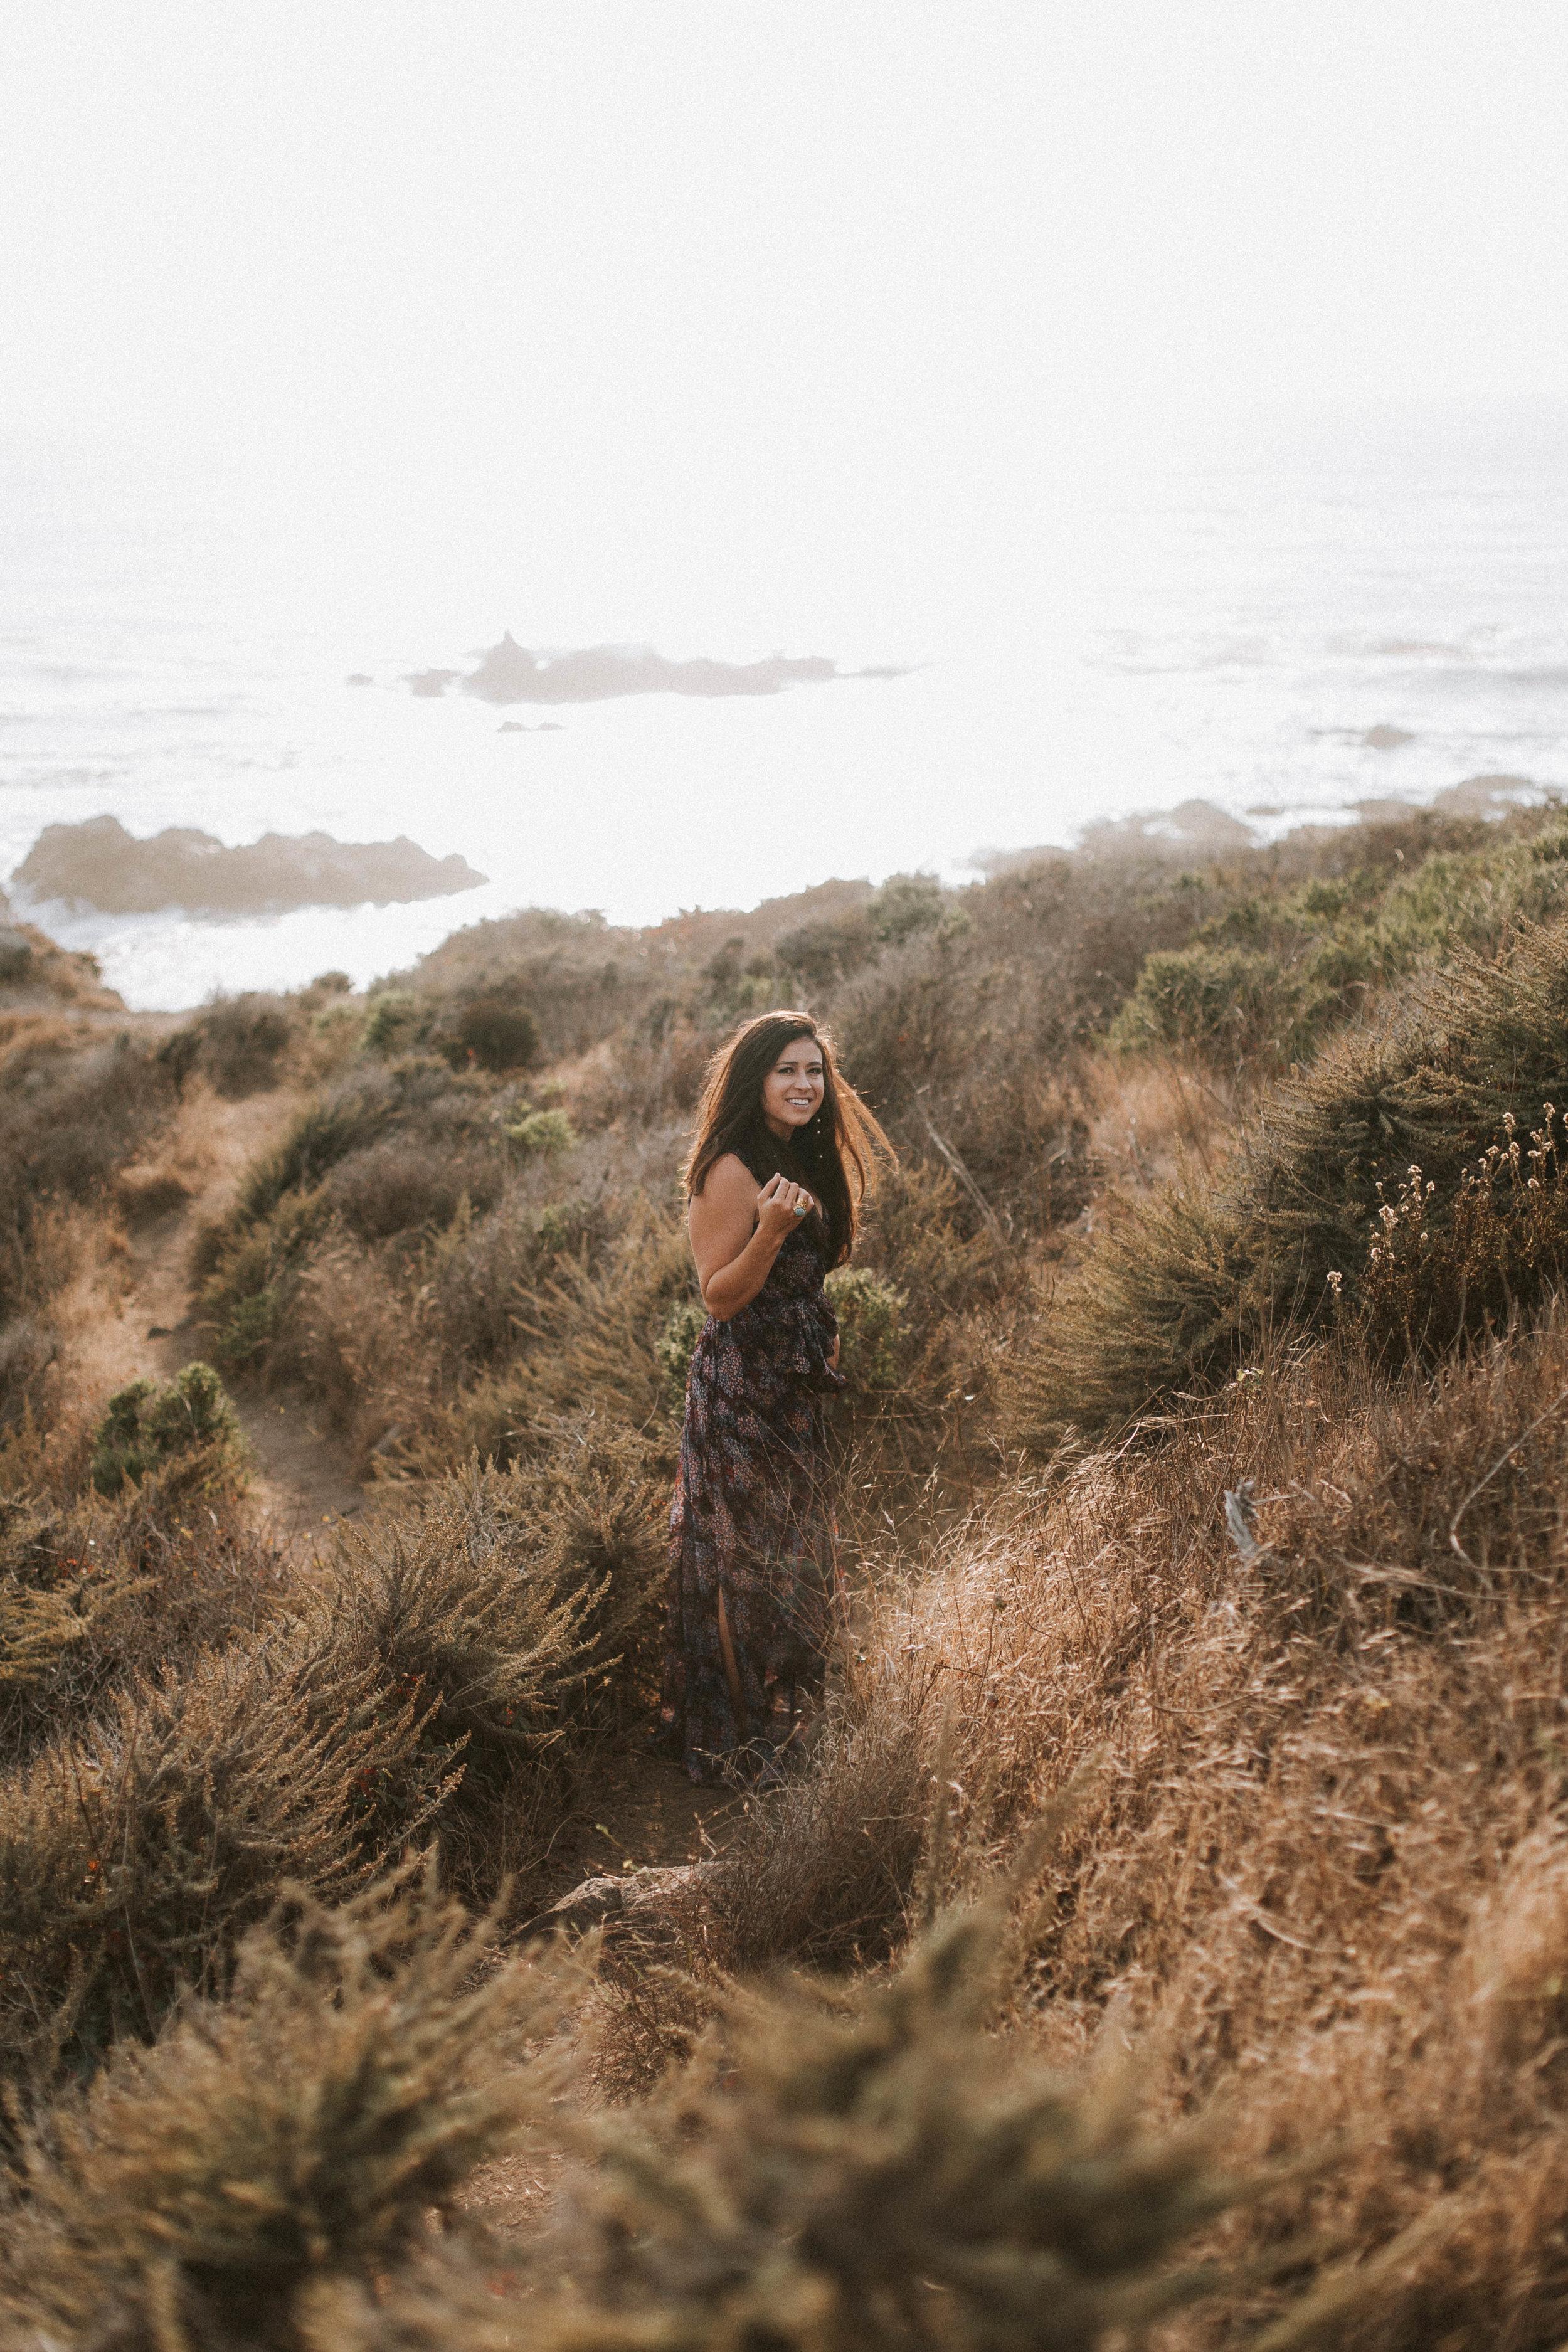 nicole-daacke-photography-big-sur-california-coast-adventure-engagement-photos-adventurous-elopement-intimate-wedding-photographer-golden-coastal-cali-engagement-session-35.jpg